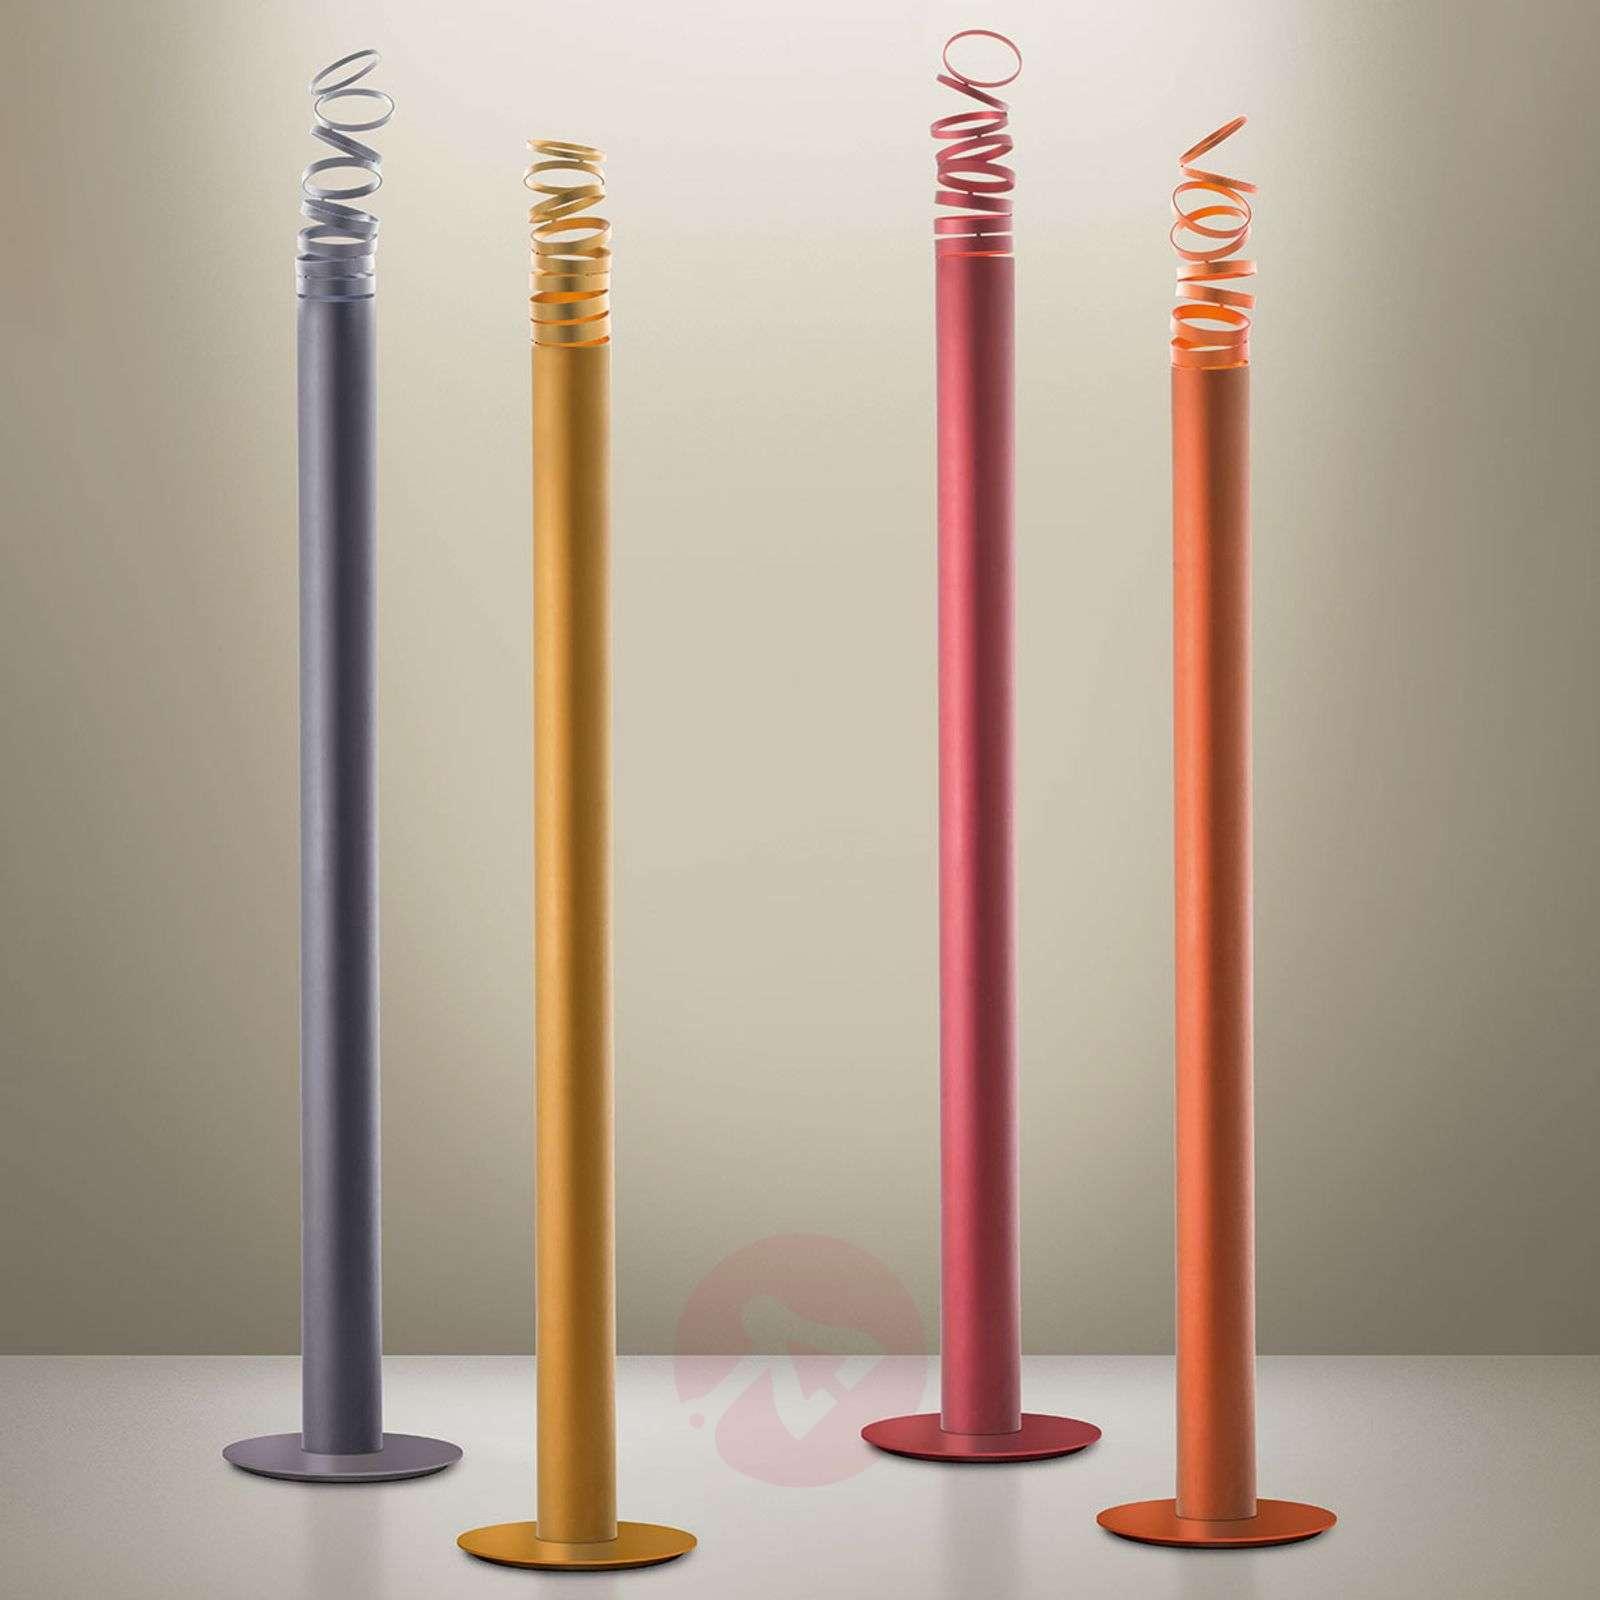 Artemide Decomposé LED-lattiavalaisin-1060158X-01